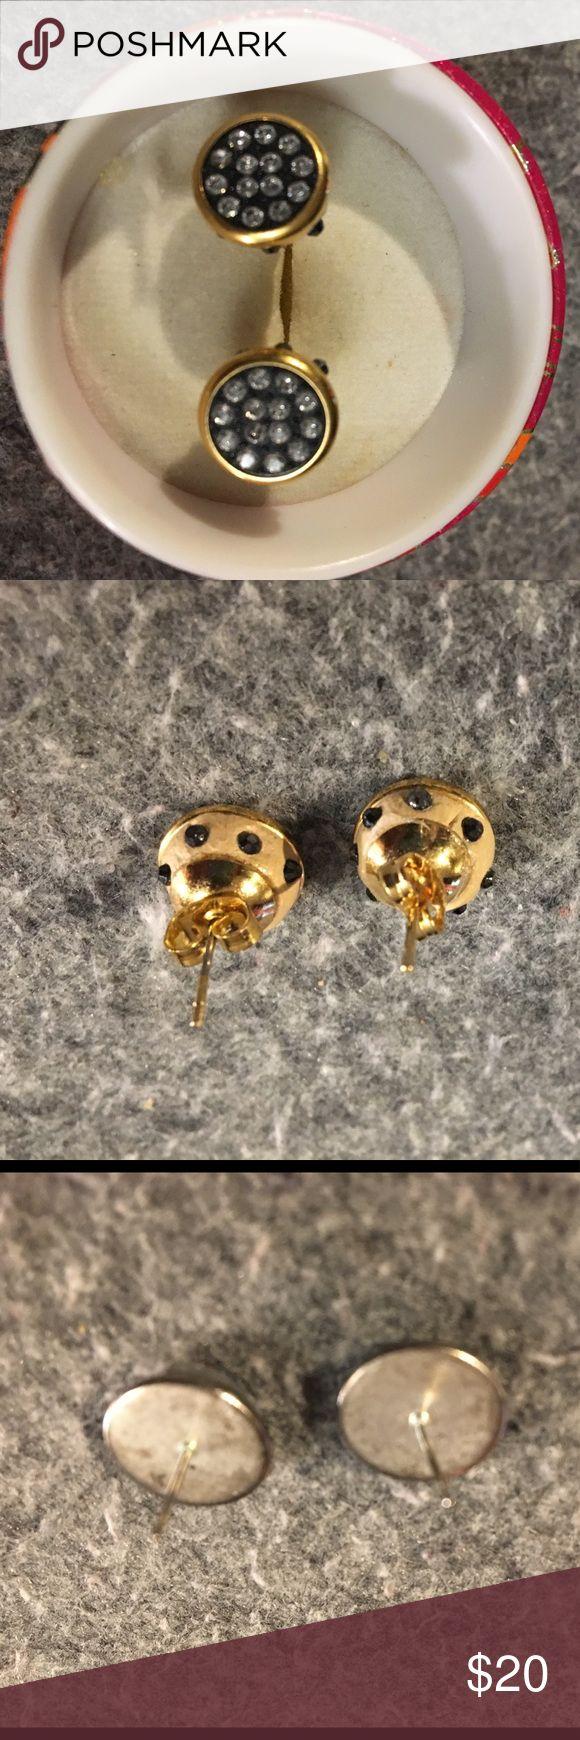 Gold pleated and Swarovski Elements Stud Earrings Handmade in Mexico. Gold pleated and Swarovski Elements Stud Earrings Jewelry Earrings